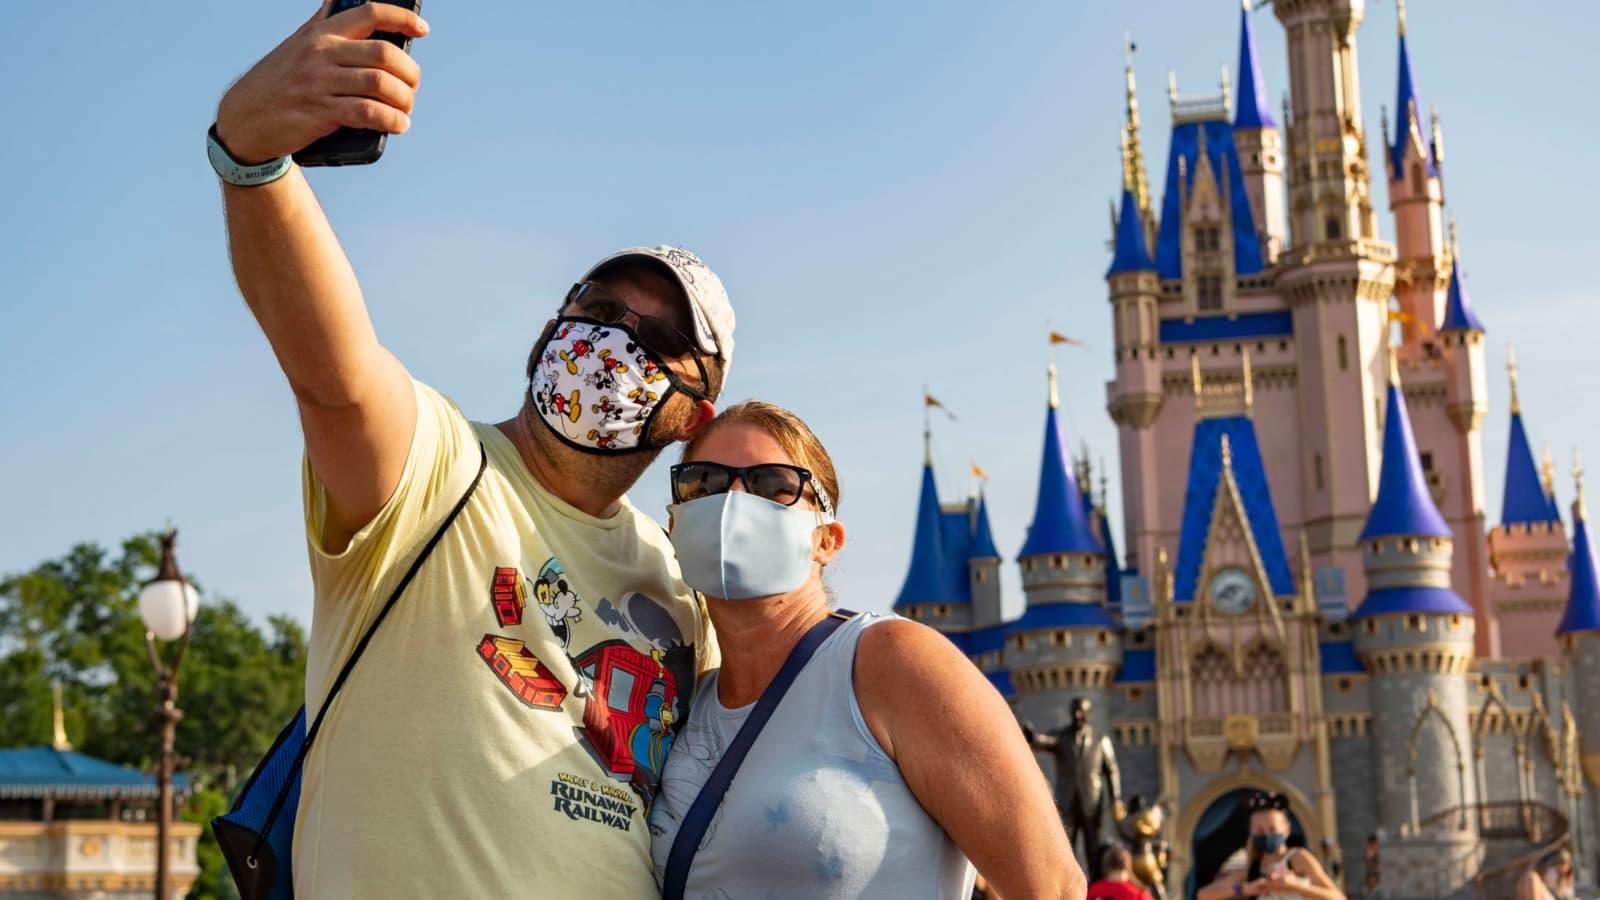 Disney To Lay Off 28 000 Employees As Coronavirus Slams Theme Park Business